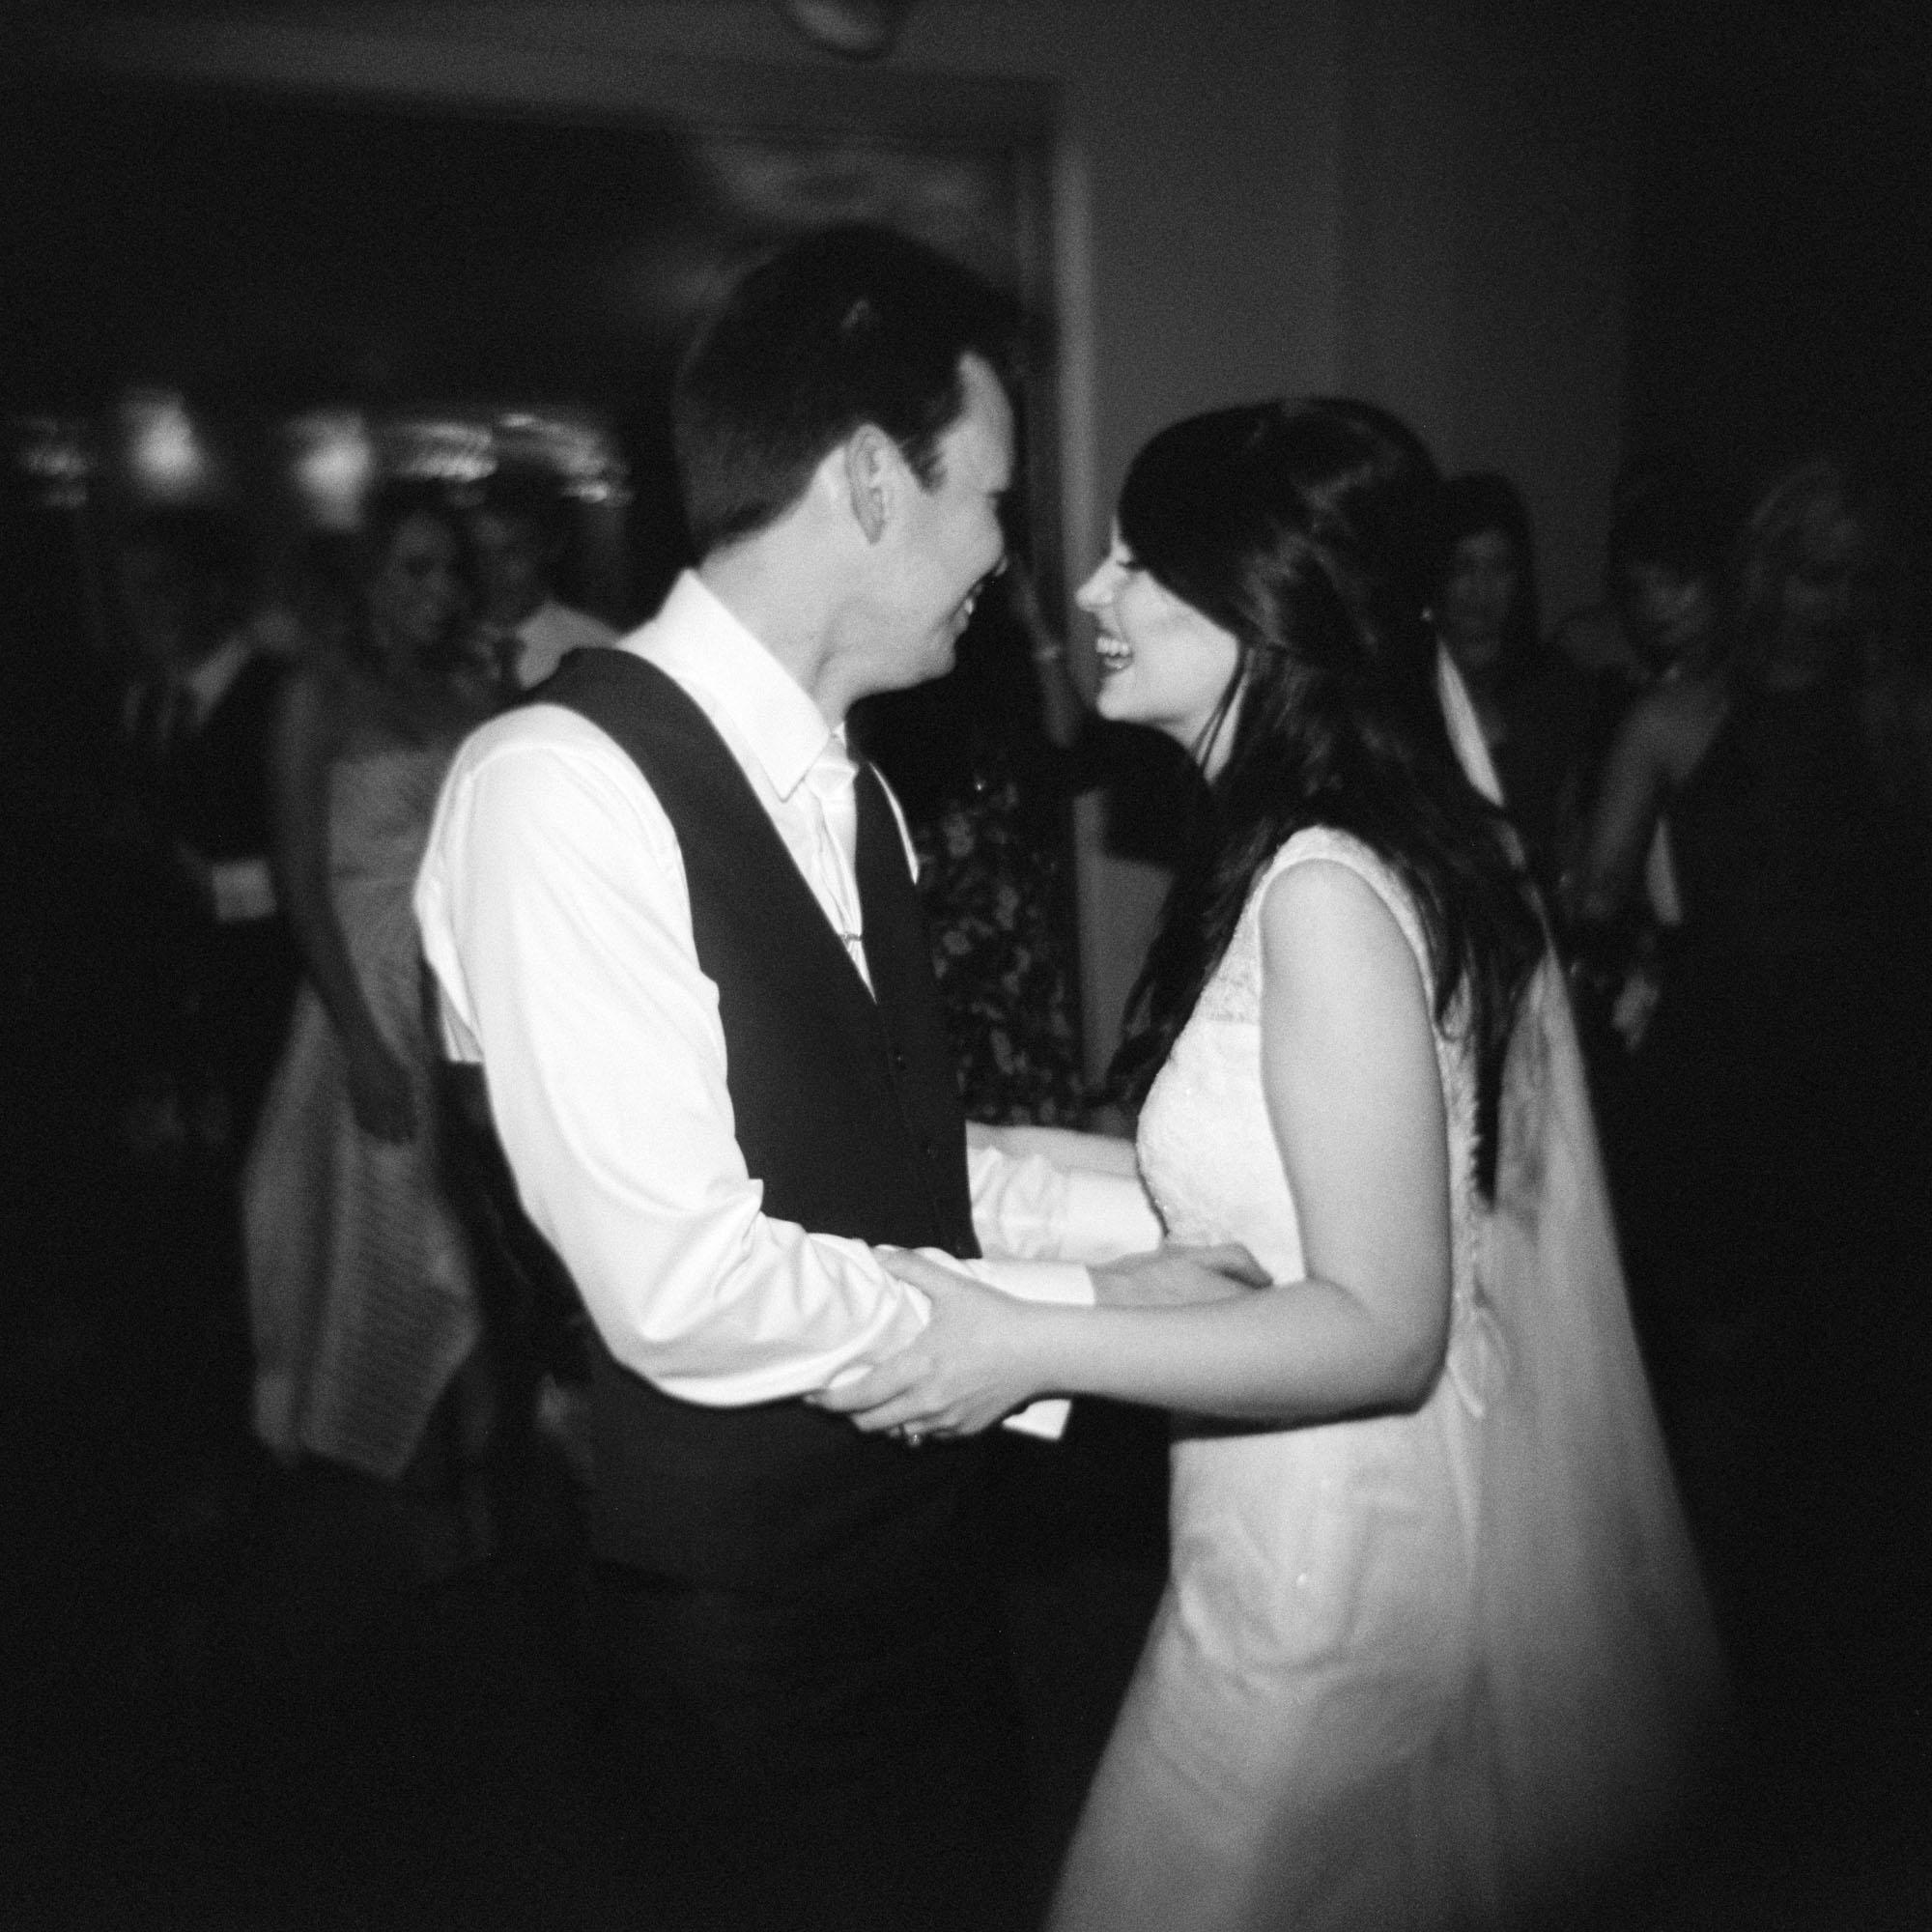 Glen-Ewin-Estate-wedding-photography-111.jpg